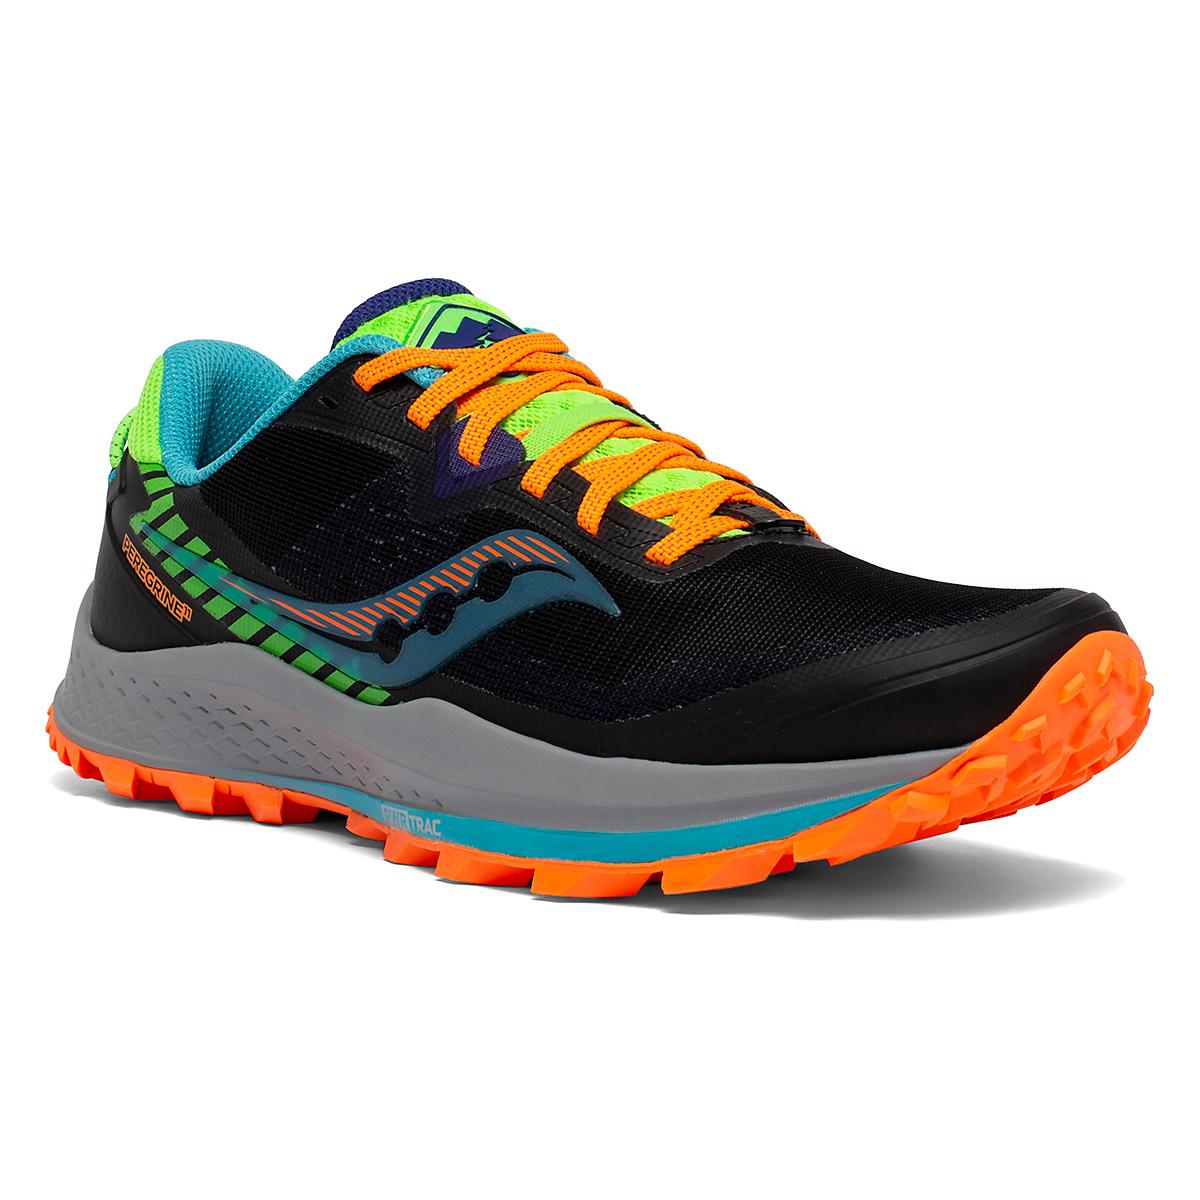 Men's Saucony Peregrine 11 Trail Running Shoe - Color: Future/Black - Size: 8 - Width: Regular, Future/Black, large, image 3